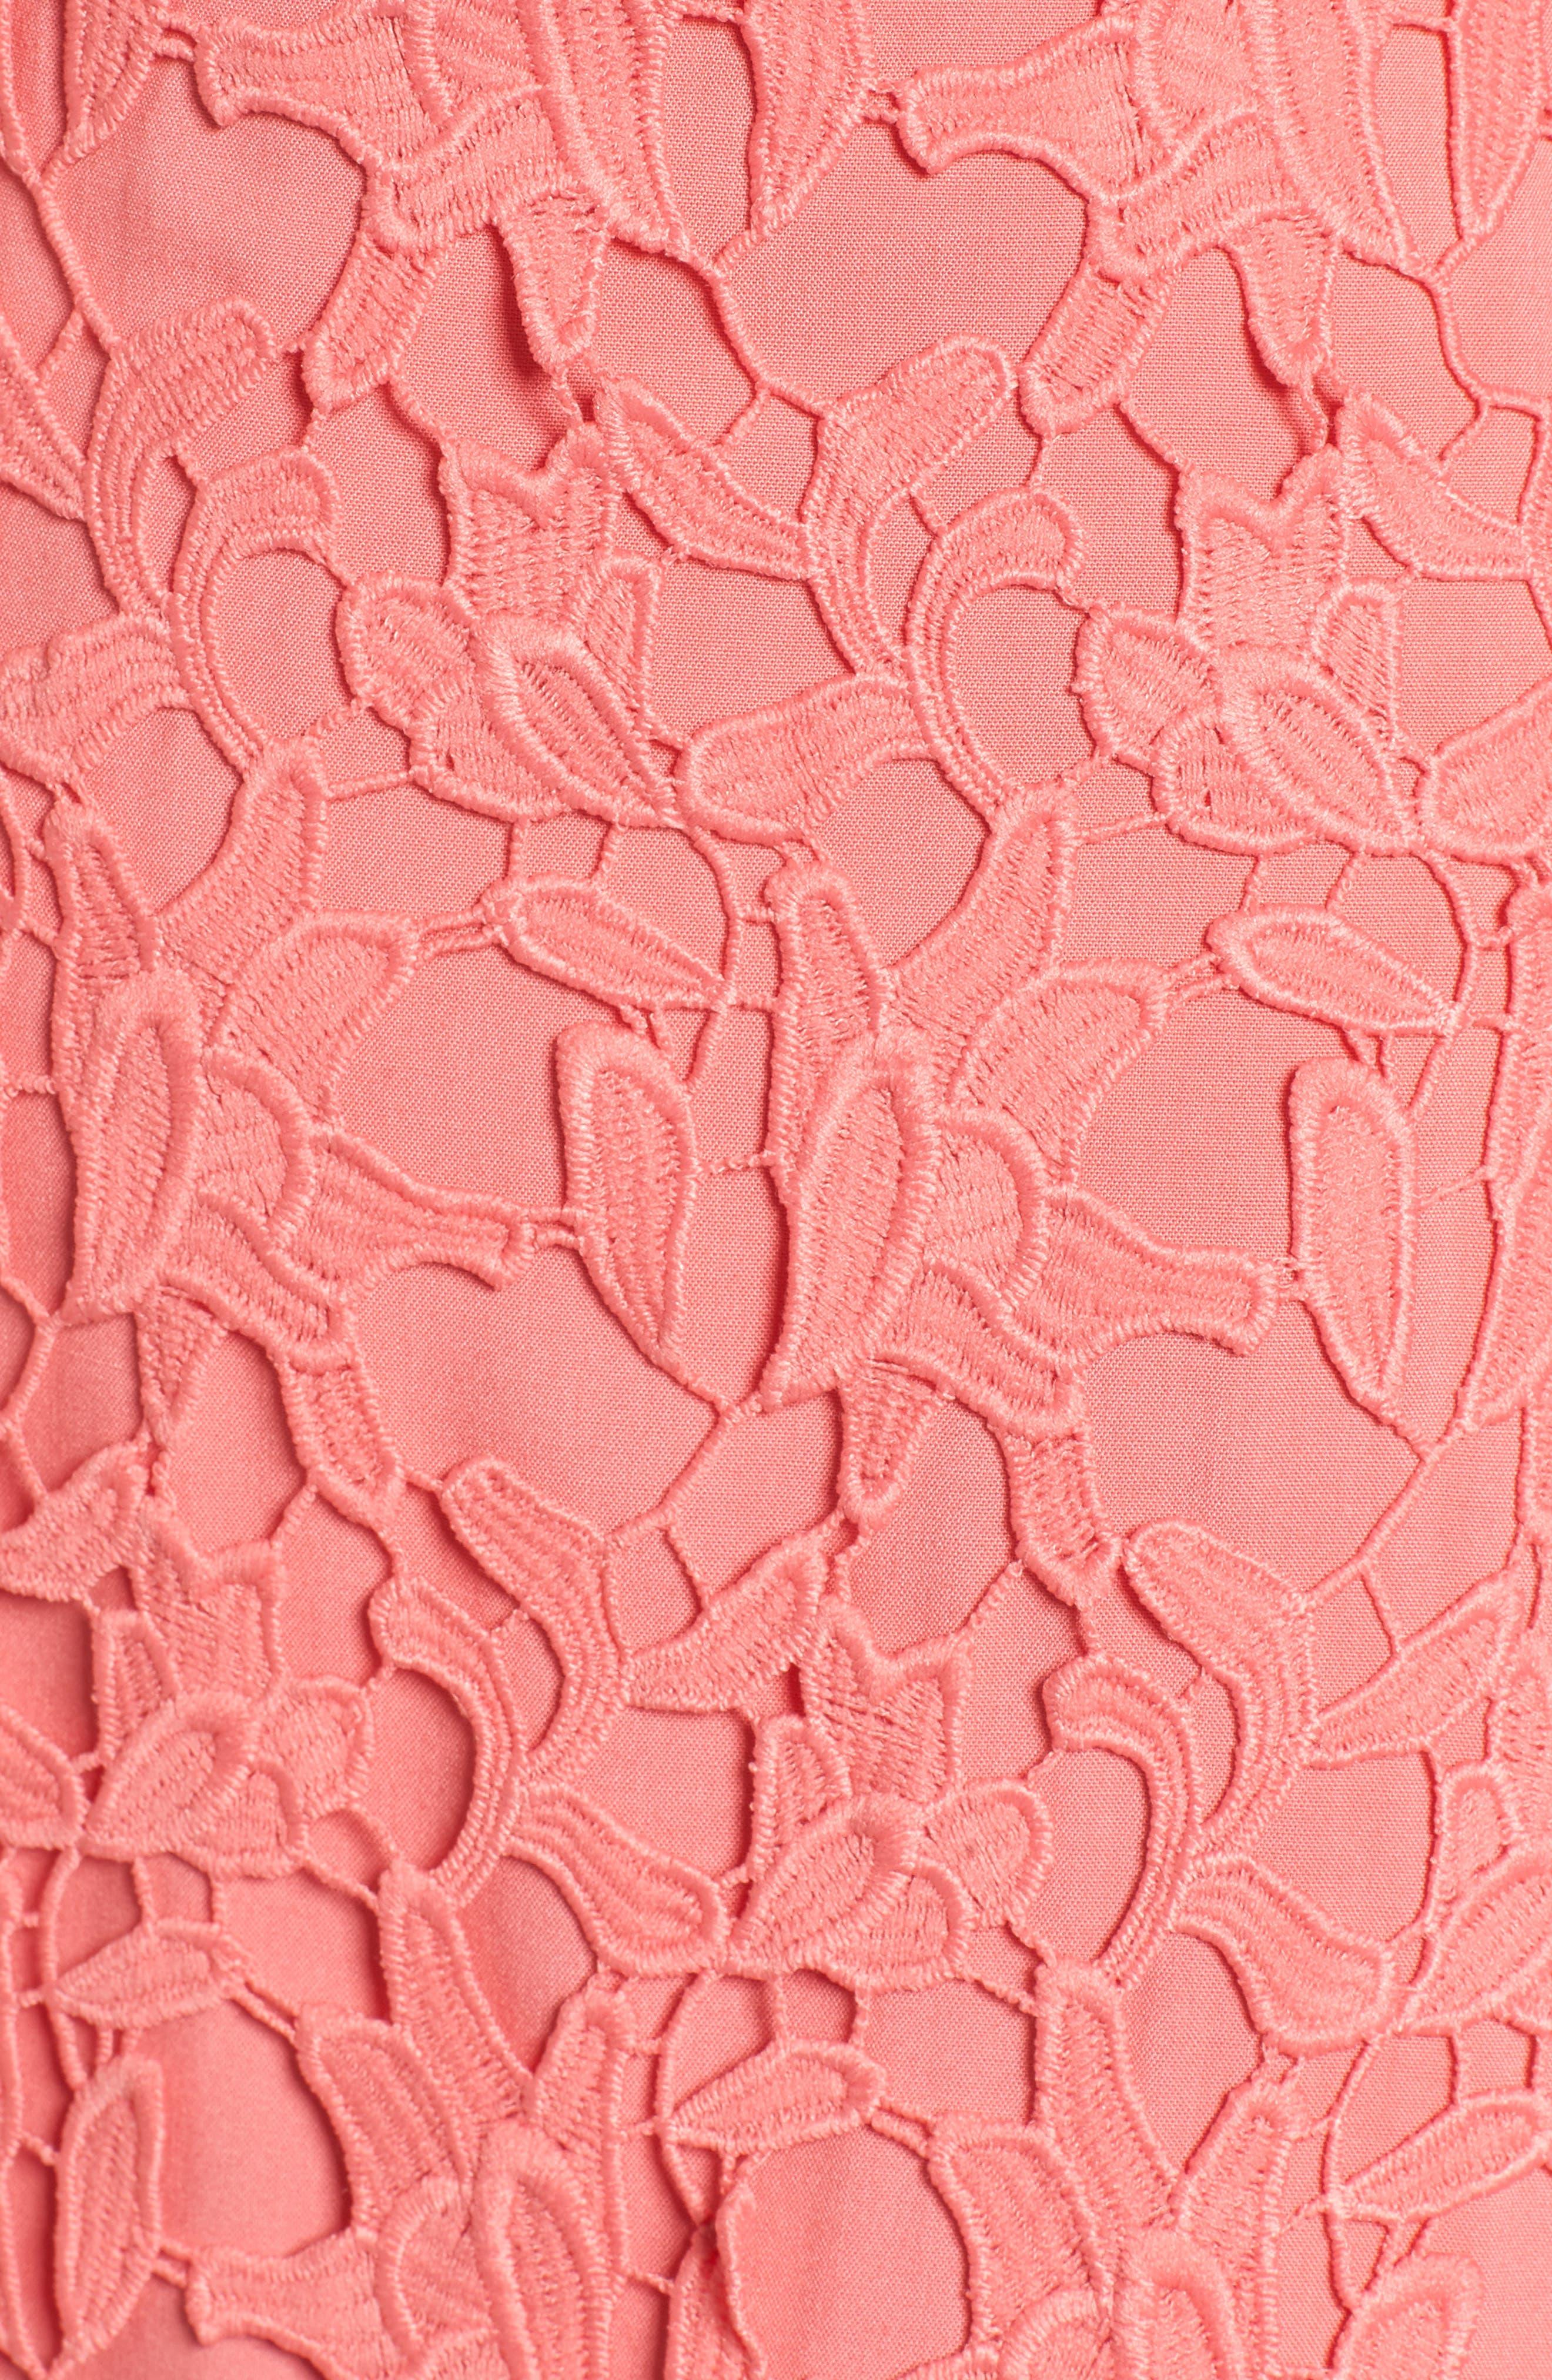 Off the Shoulder Lace Minidress,                             Alternate thumbnail 6, color,                             Coral